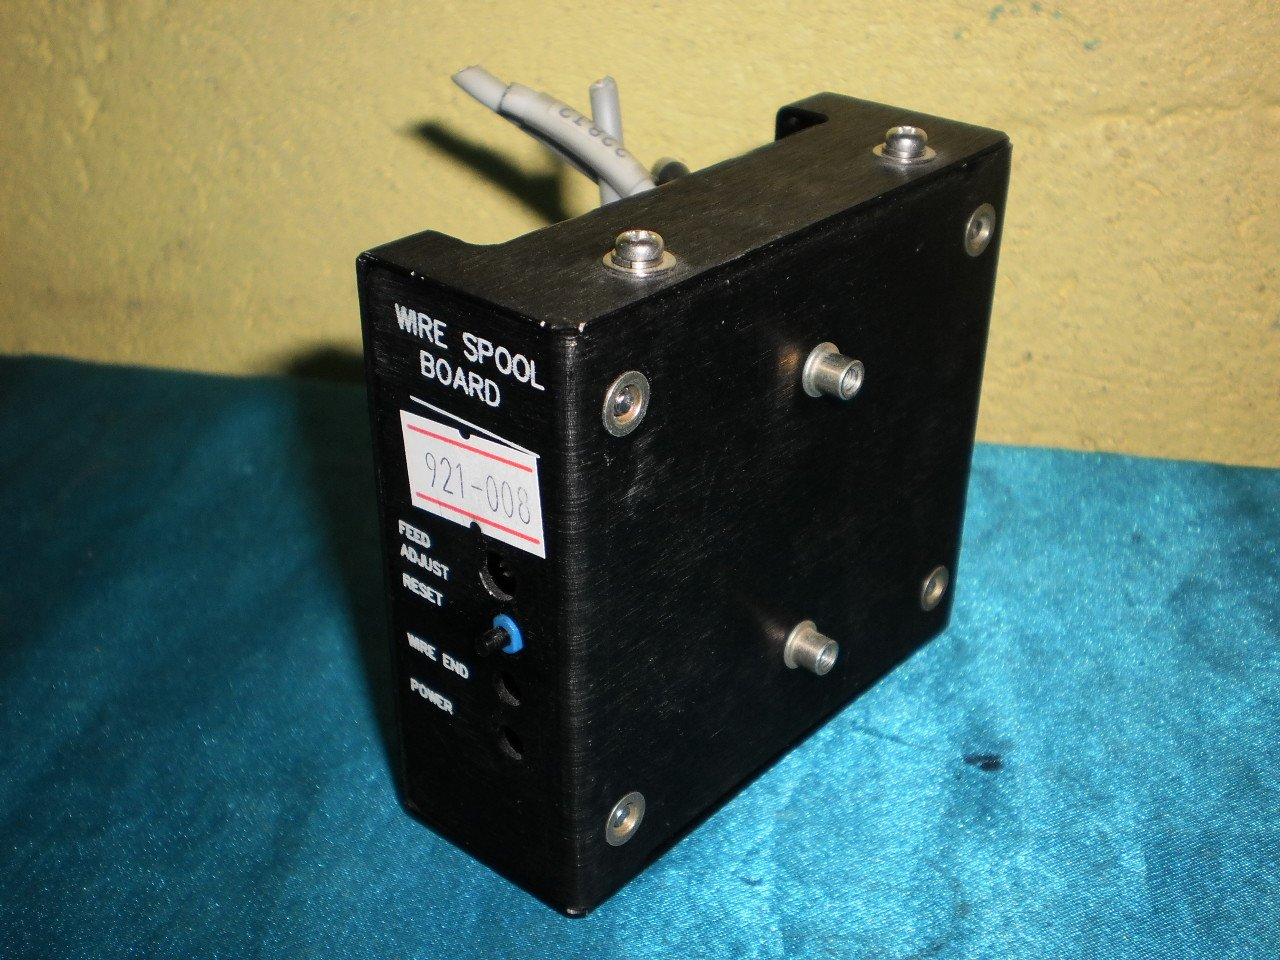 ASM 03-28228 REV B Wire Spool Board